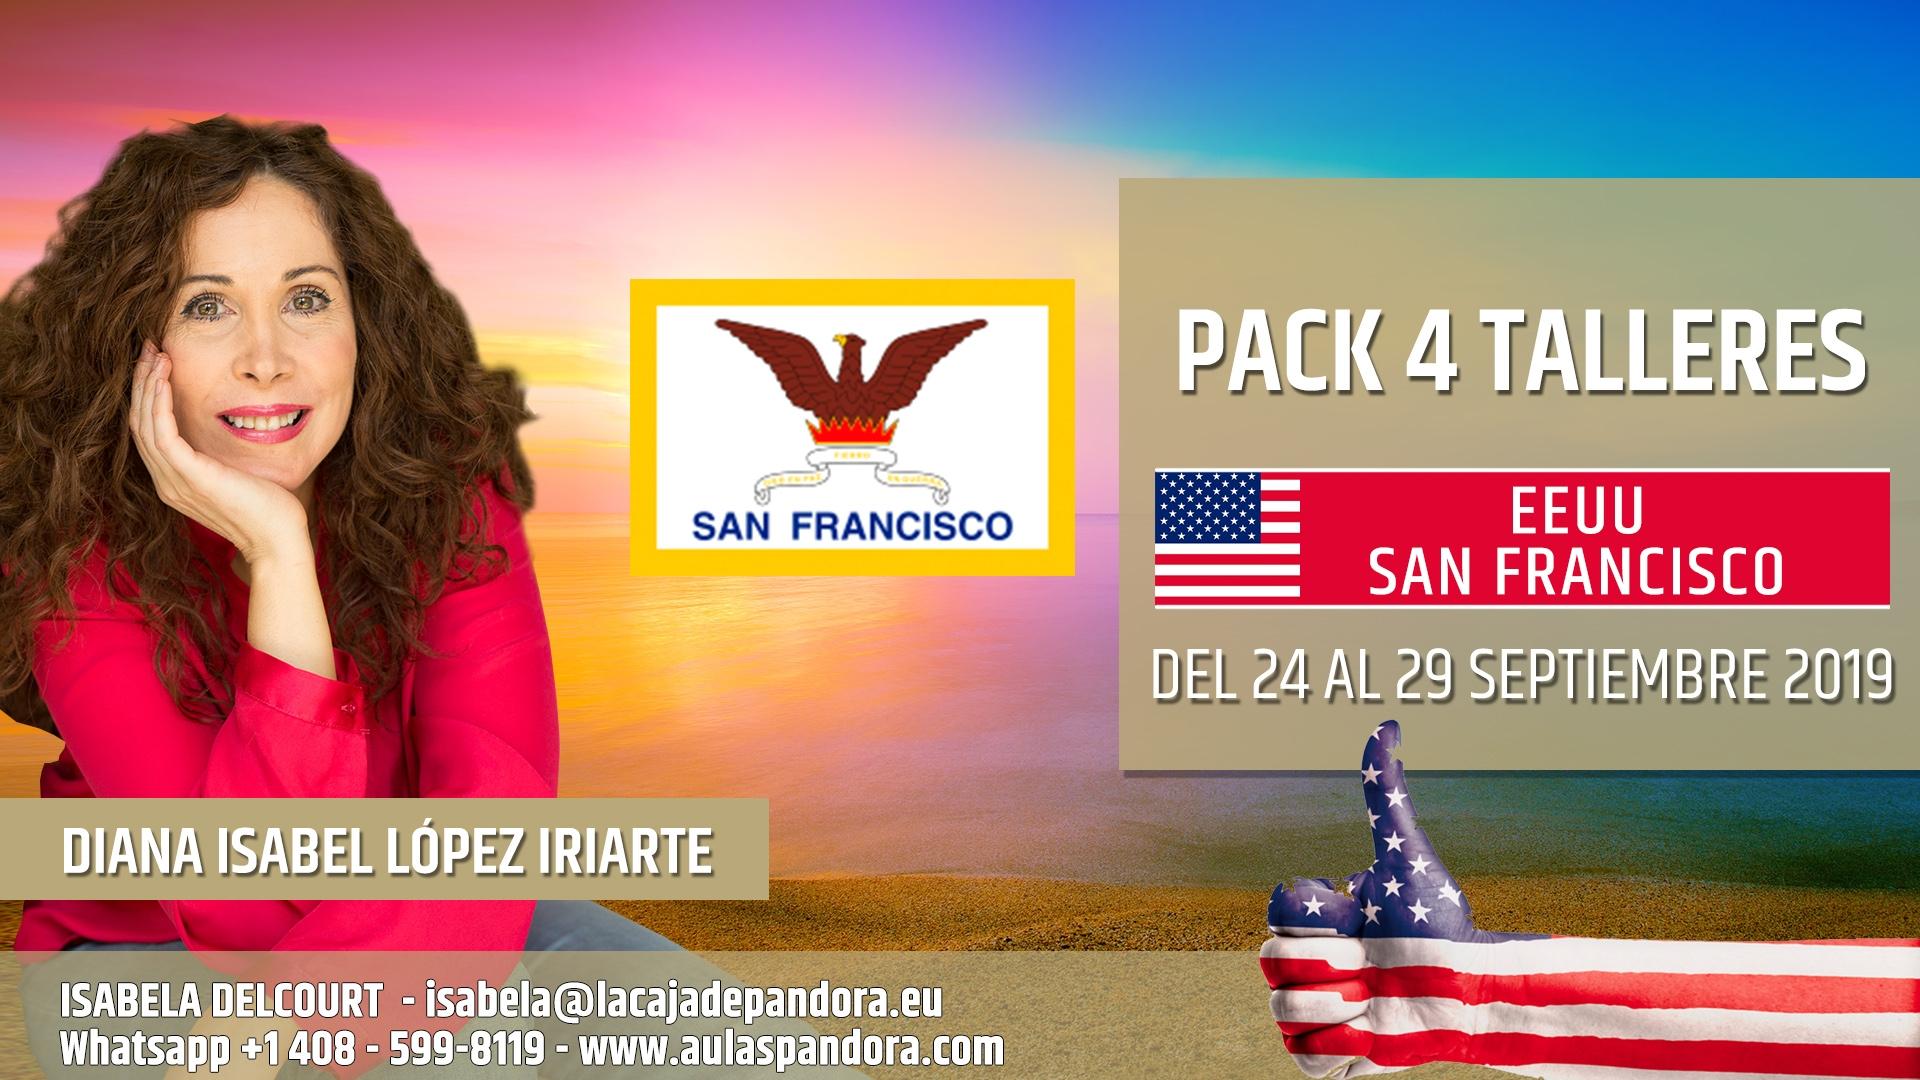 Diana Lopez Iriarte EEUU San Francisco Mayo 2019